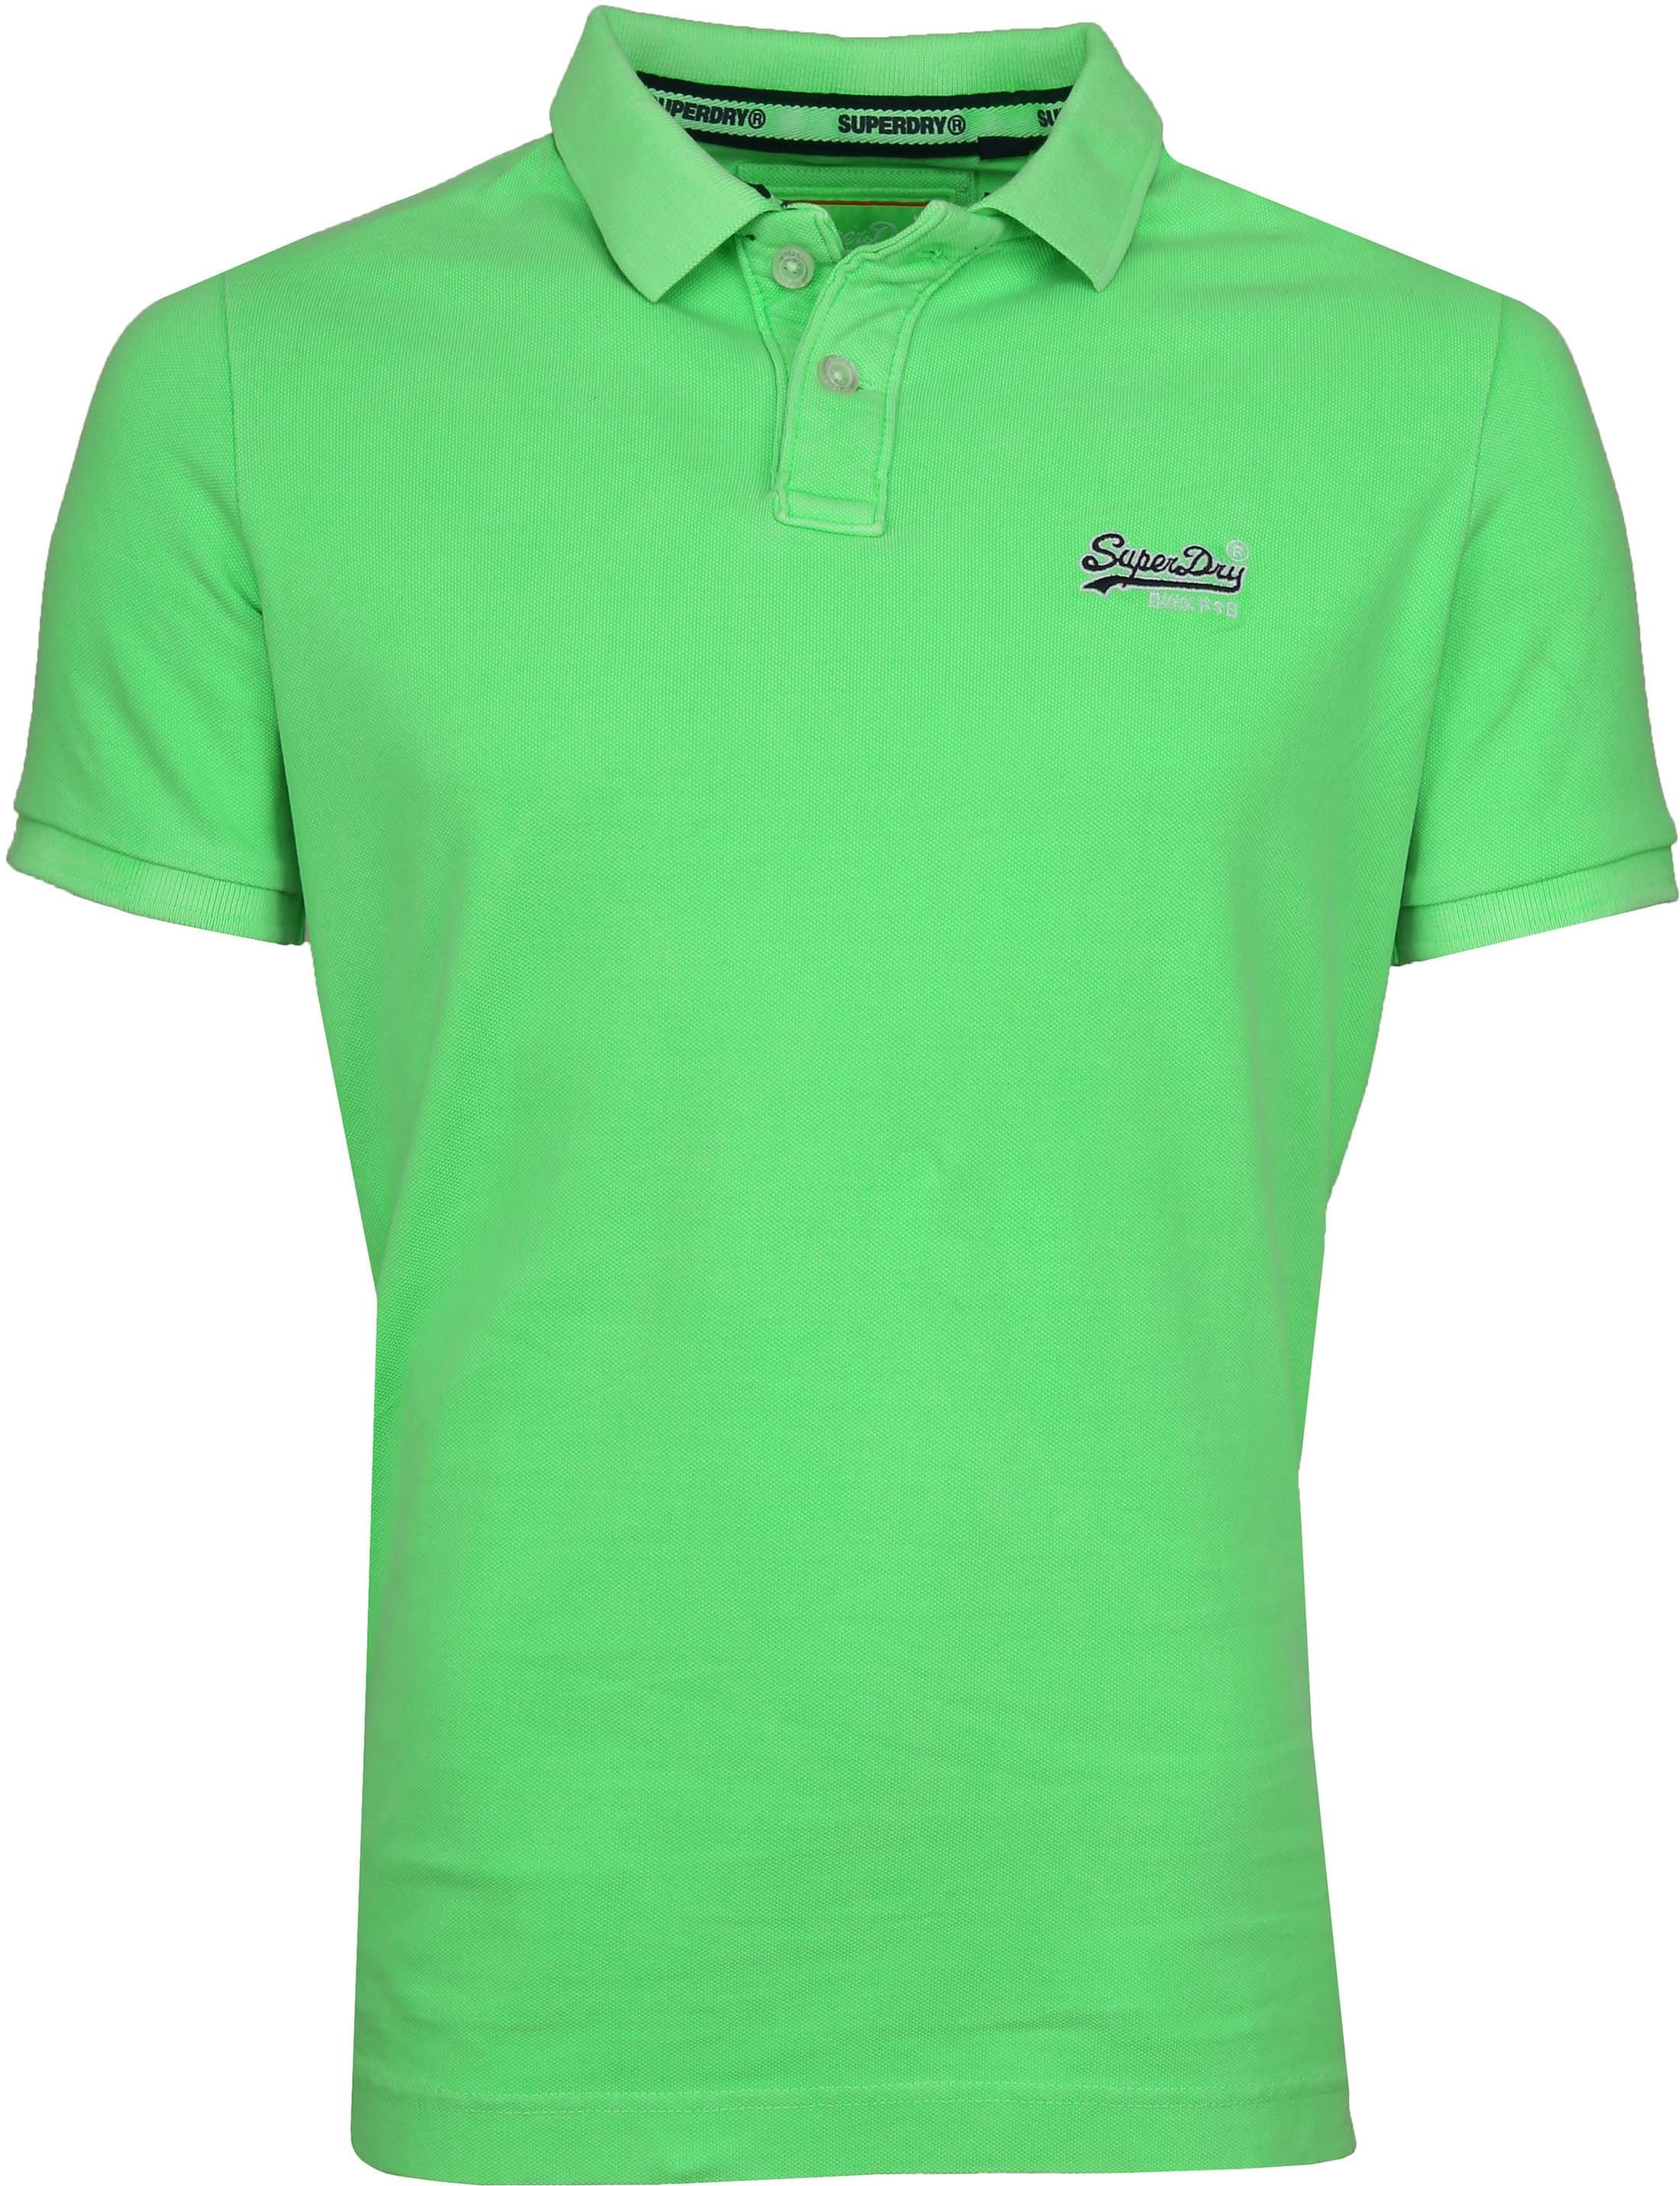 Superdry Poloshirt Fluro Green foto 0